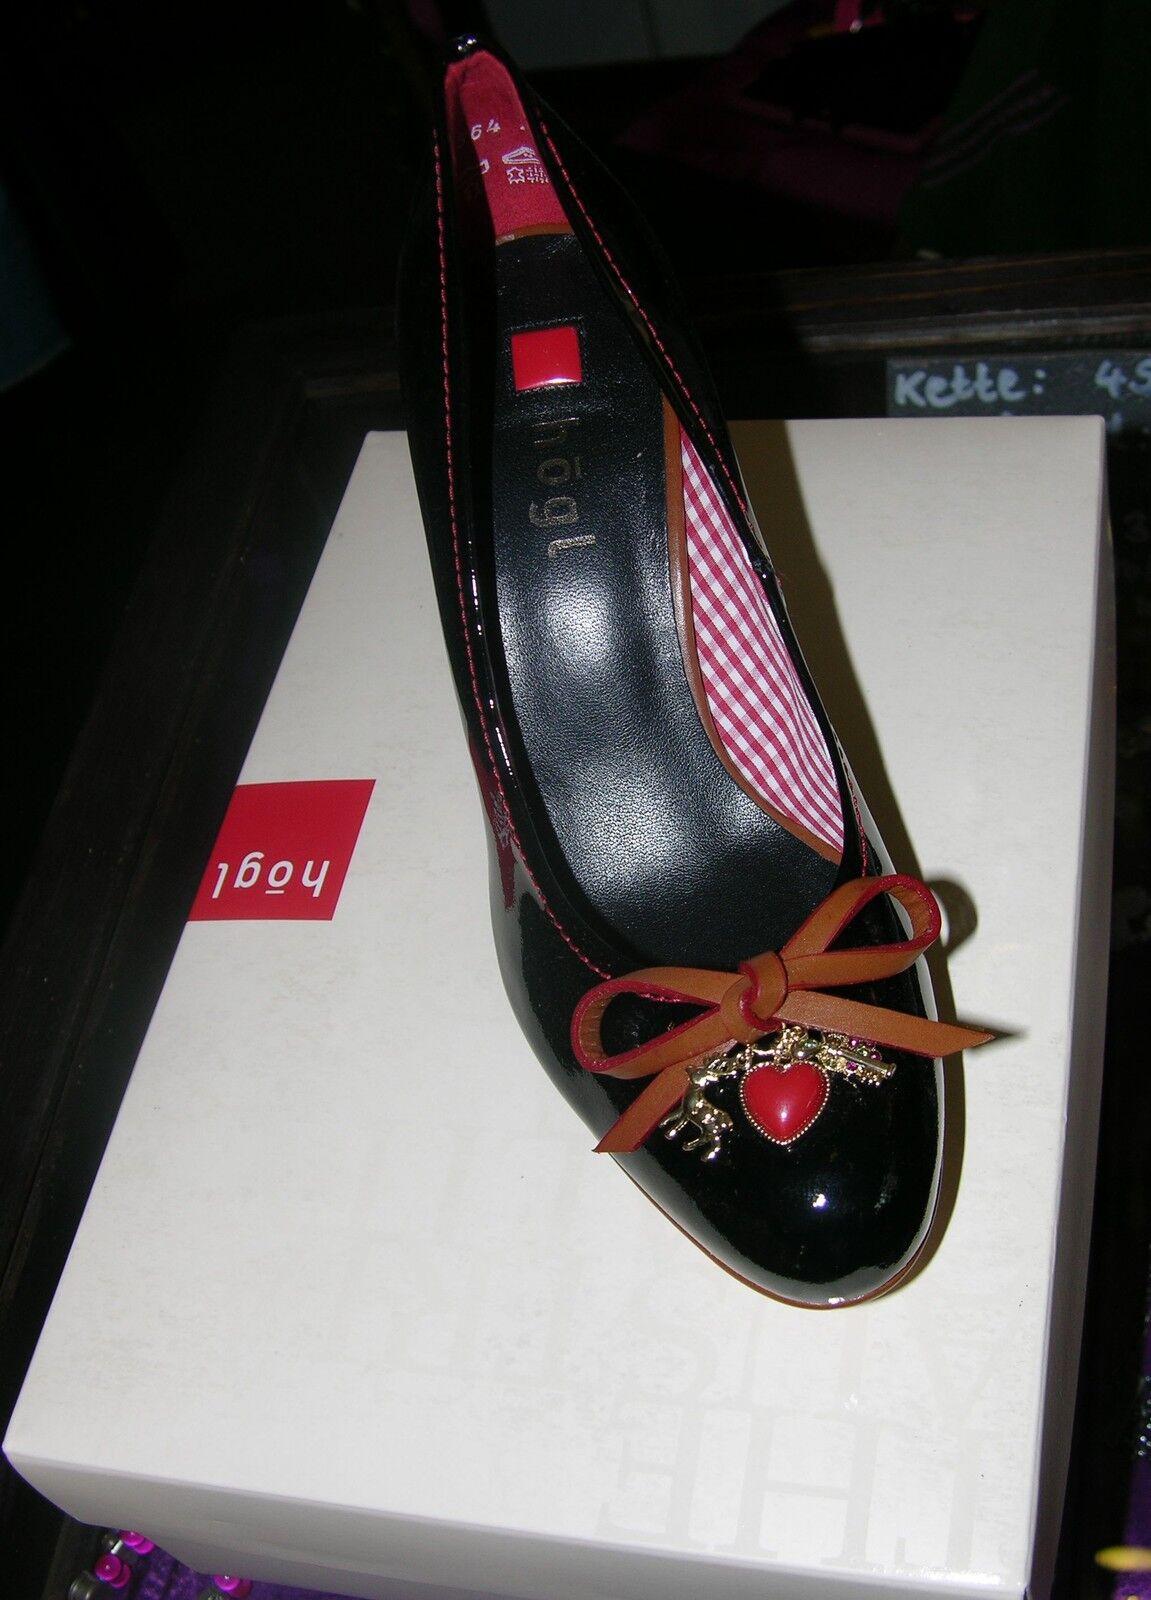 Högl Pumps, Lackleder,schwarz, braun, 5 Dirndl Schuhe, Gr 5 braun ... 6ed41fccaf